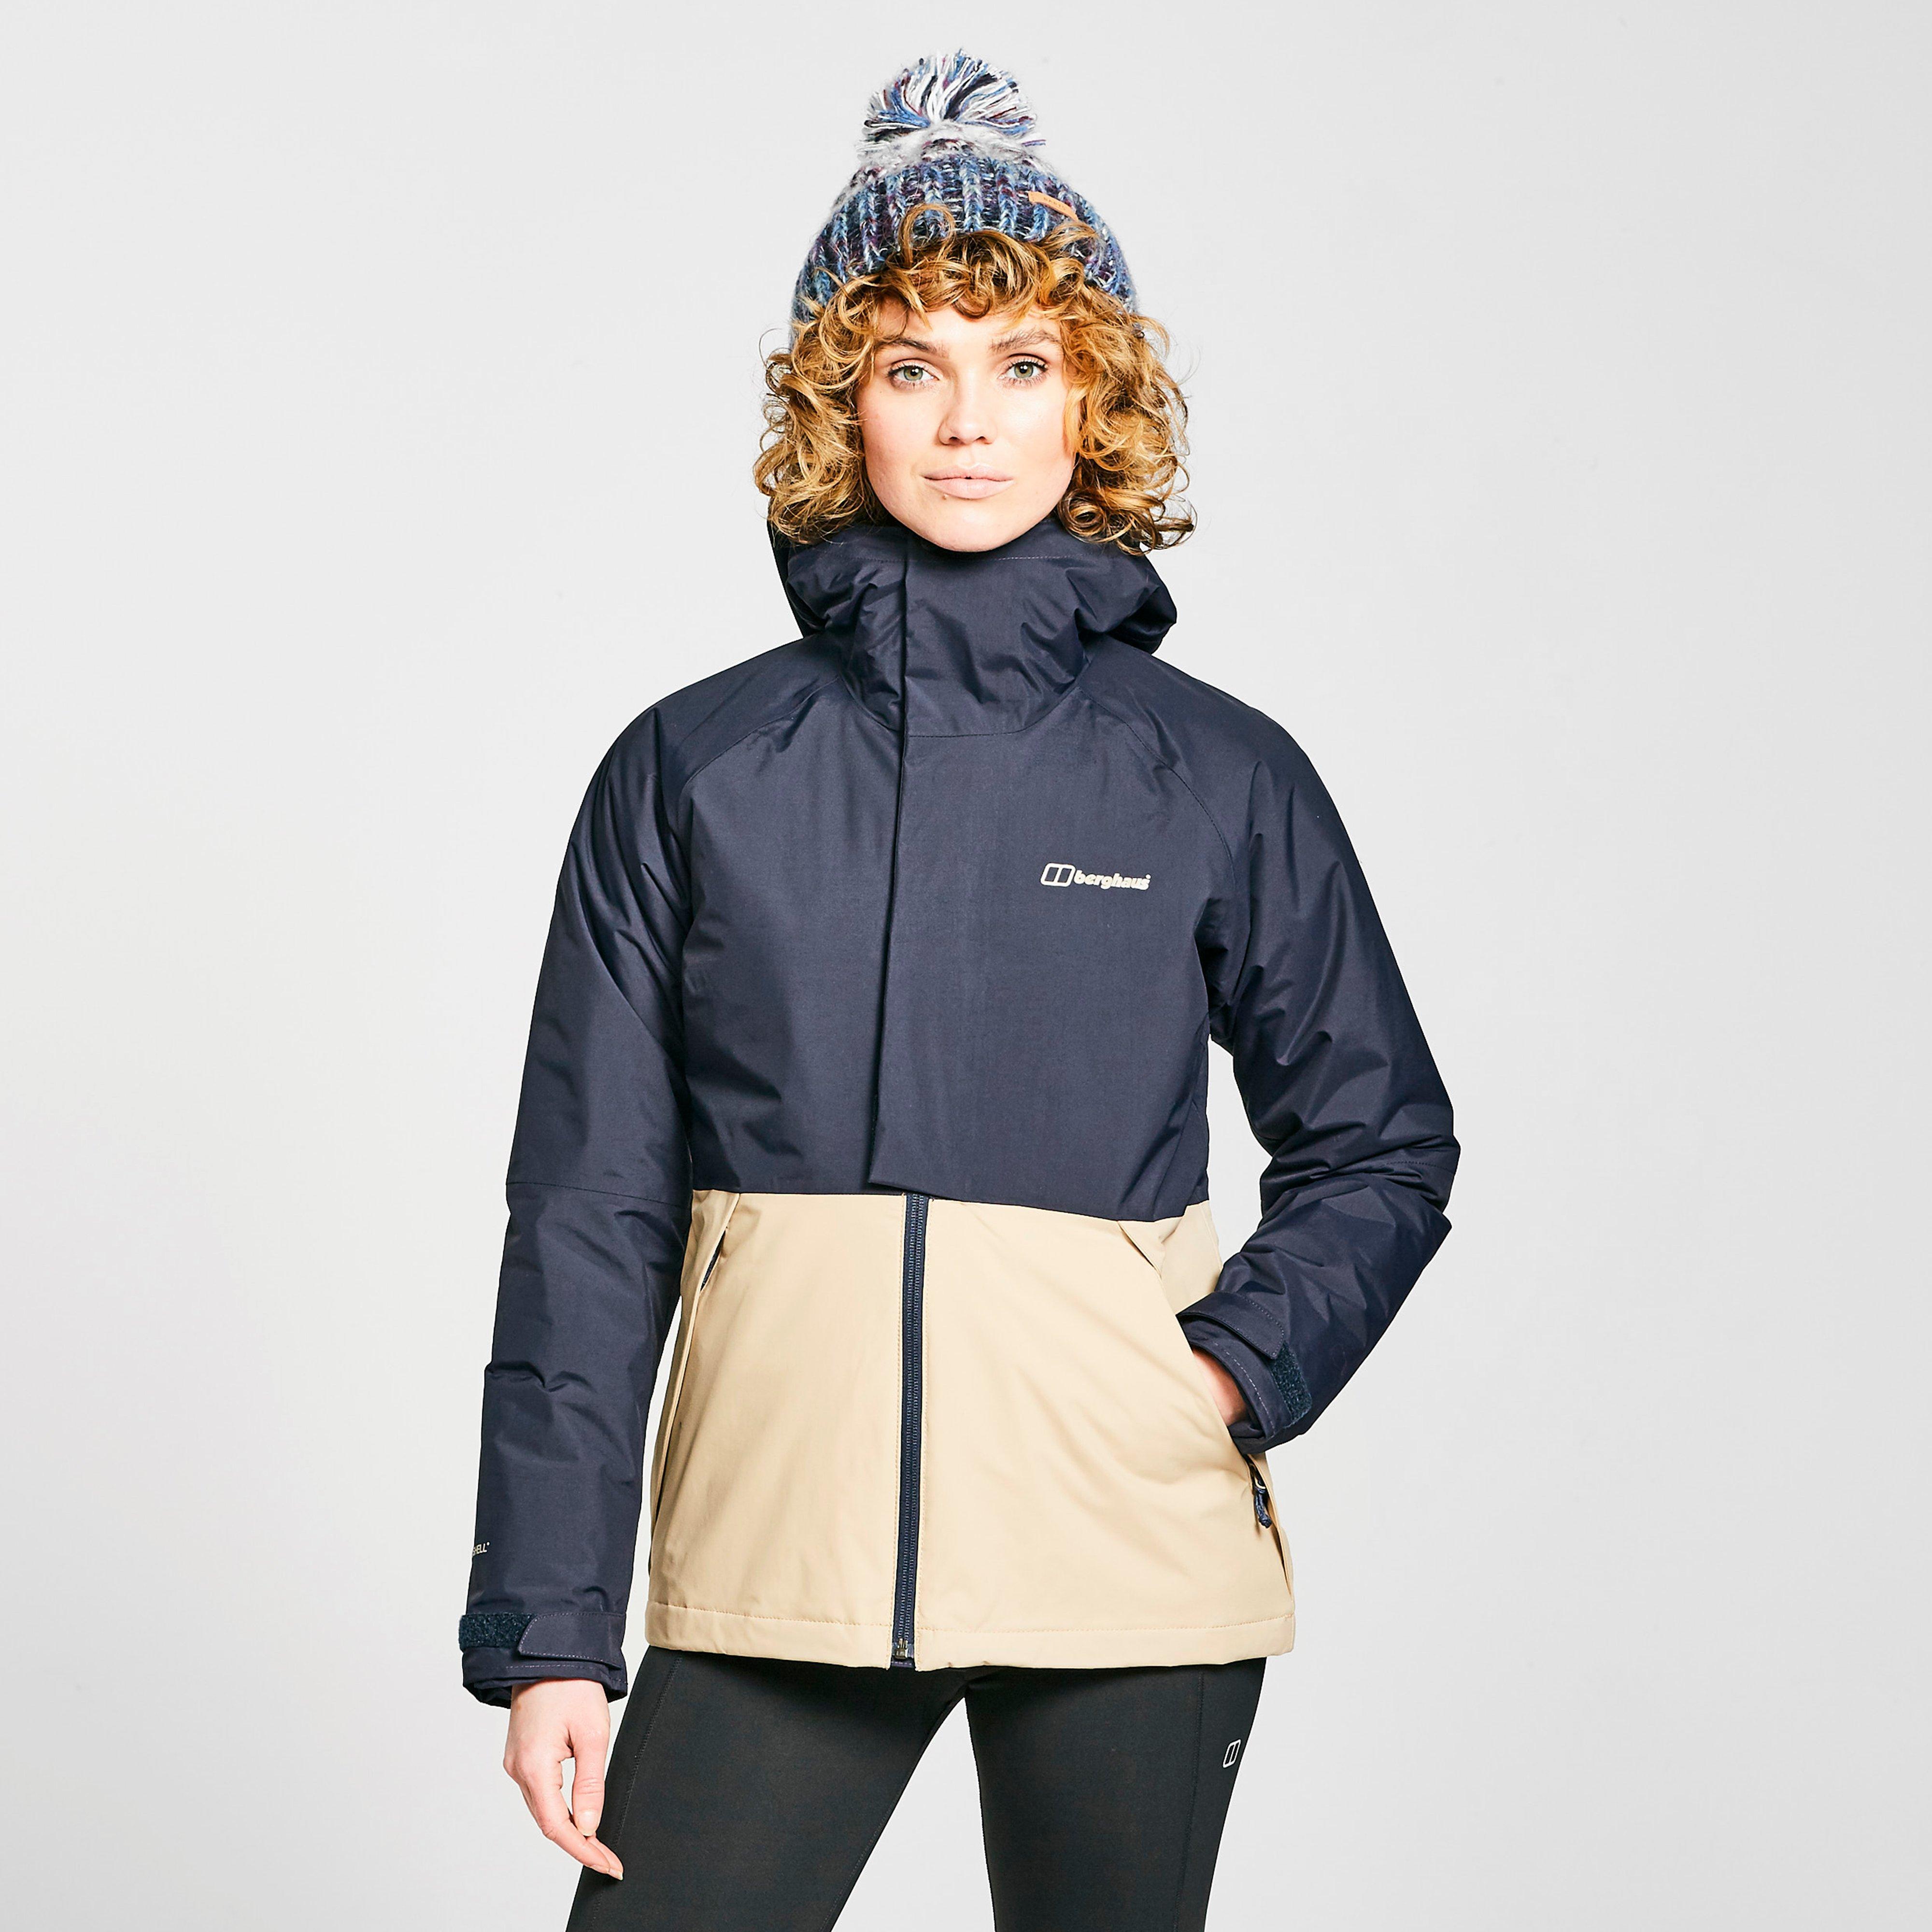 Berghaus Womens Rhyna Waterproof Jacket - Navy/nvy/crm  Navy/nvy/crm